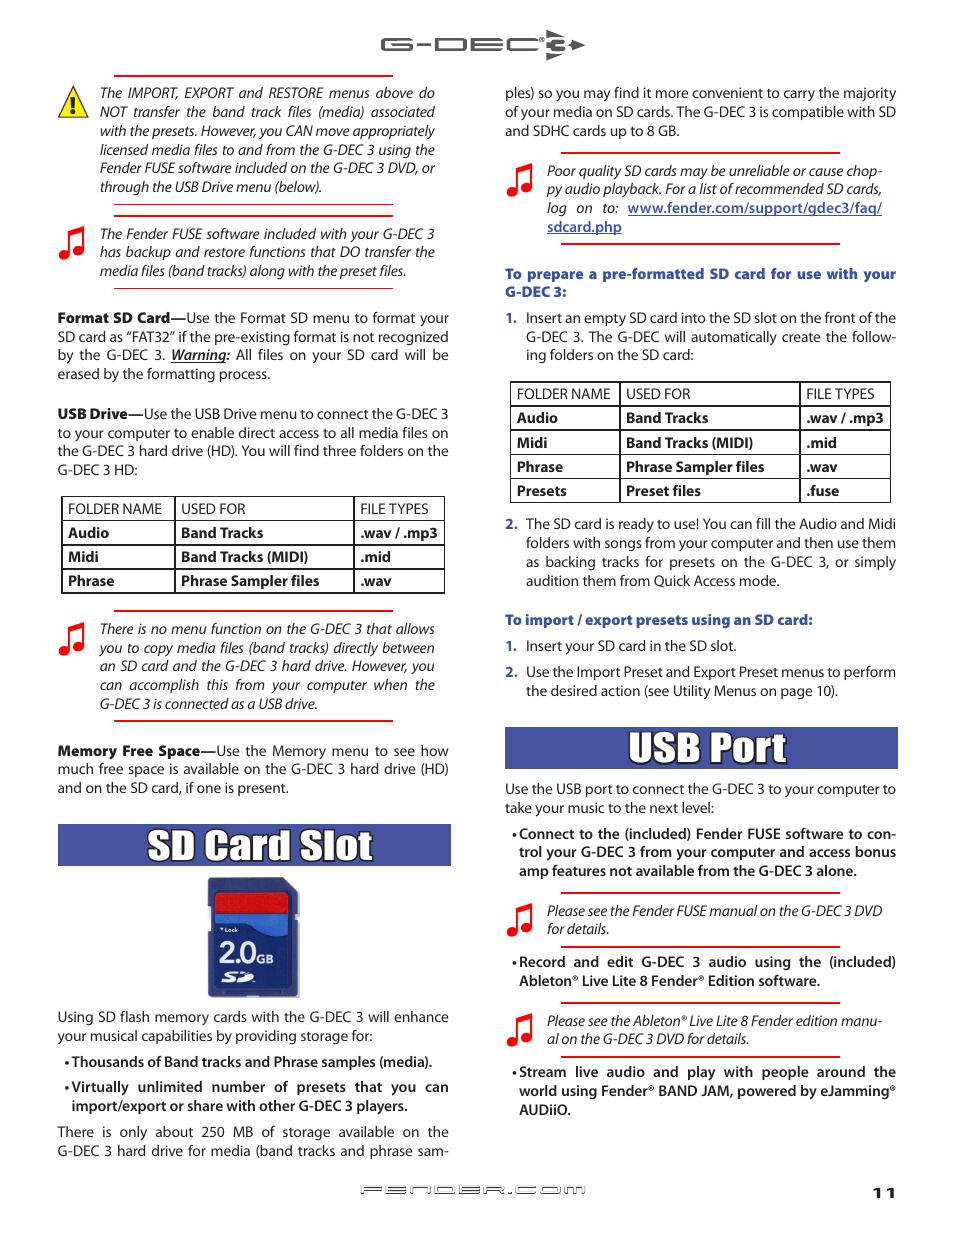 Sd card slot, External storage of tracks and presets, Usb port